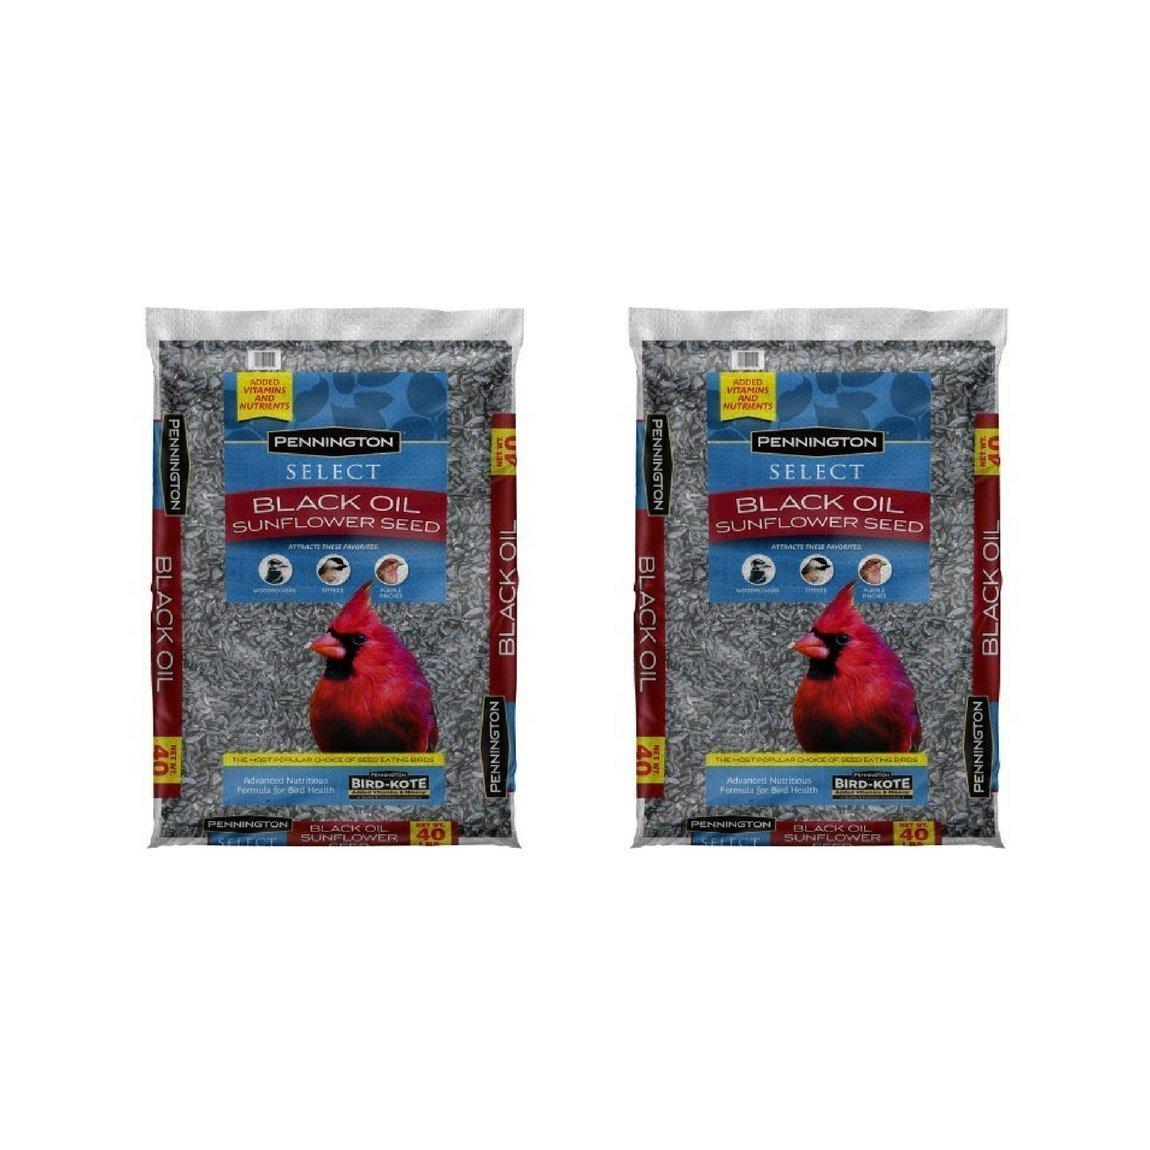 Pennington Select Black Oil Sunflower Seed Wild Bird Feed, 40 lbs - (2 Bags)